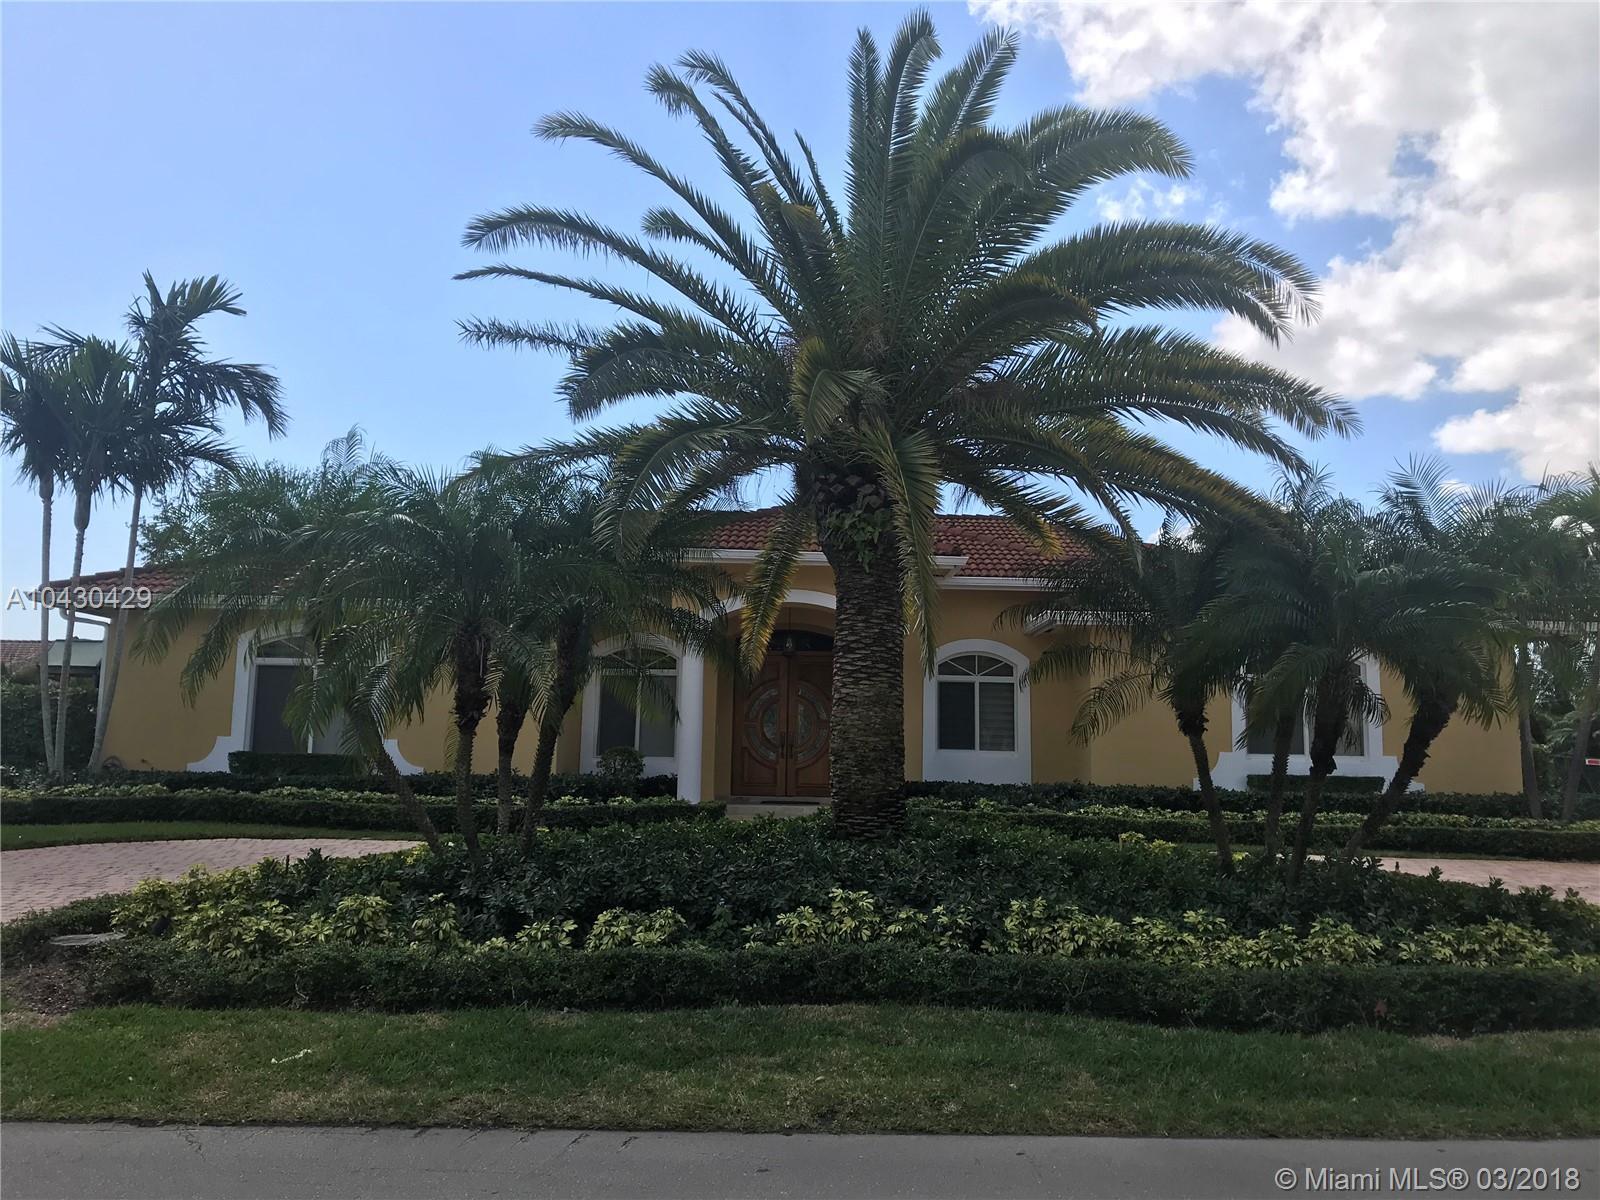 8750 Sw 164th St, Palmetto Bay FL, 33157